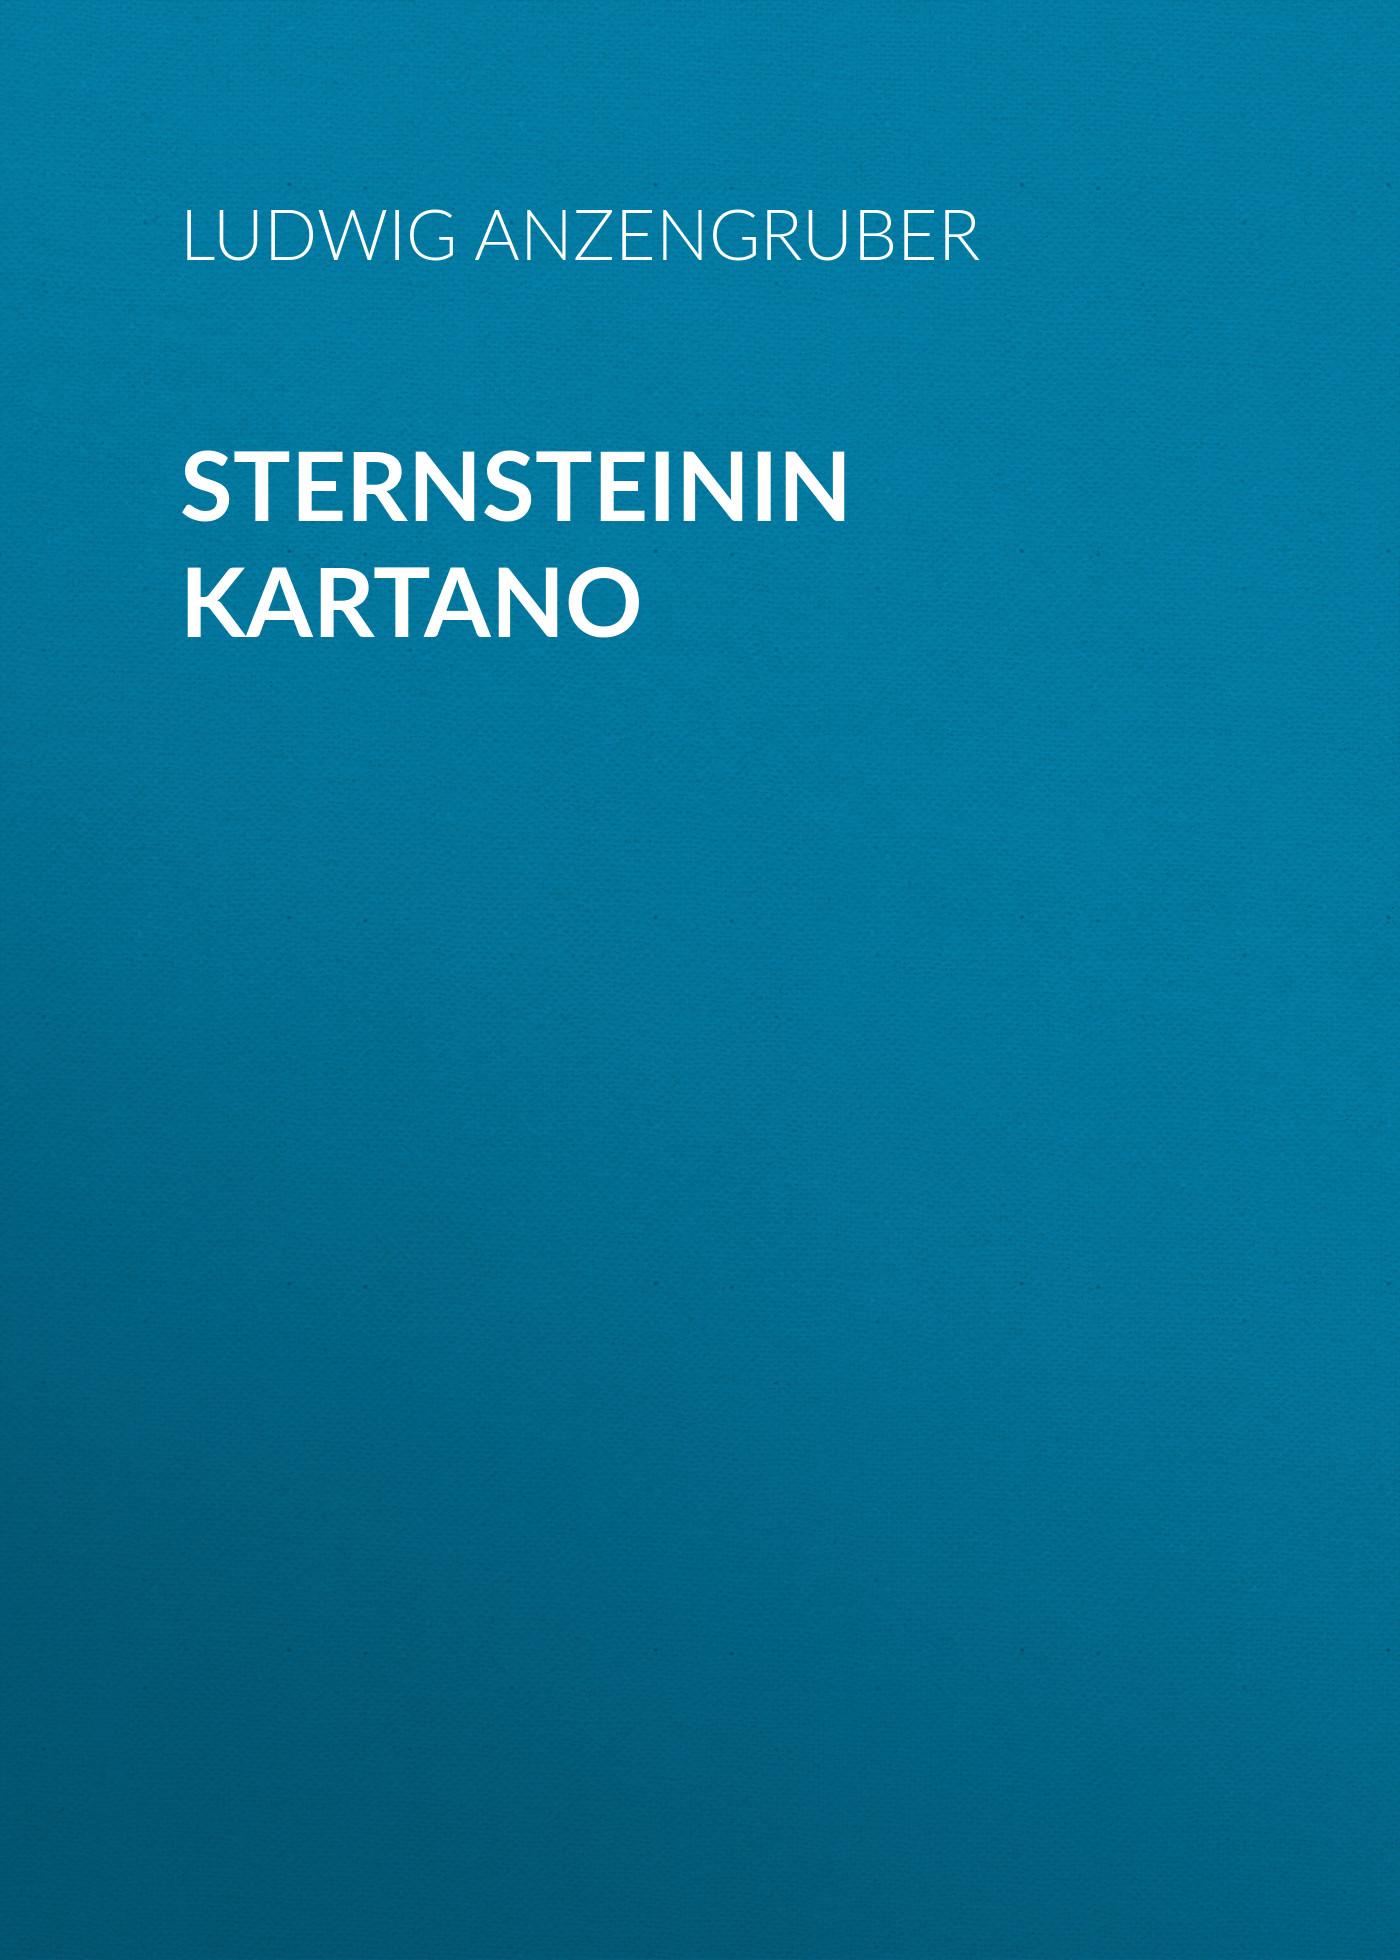 Anzengruber Ludwig Sternsteinin kartano